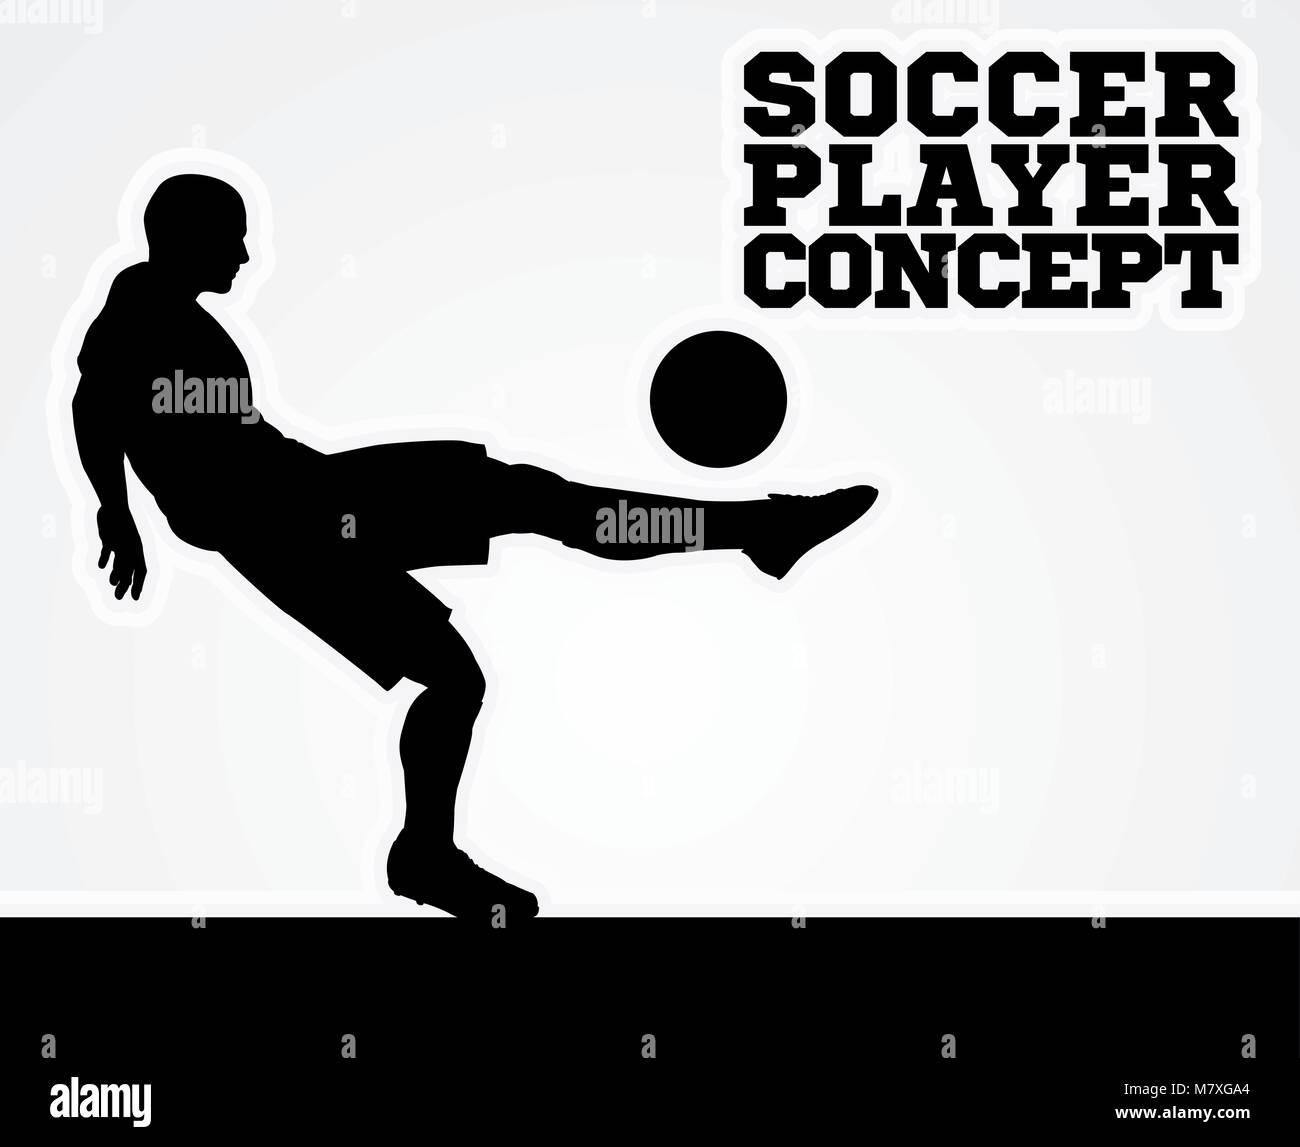 Soccer Football Player Concept Silhouette Stock Vector